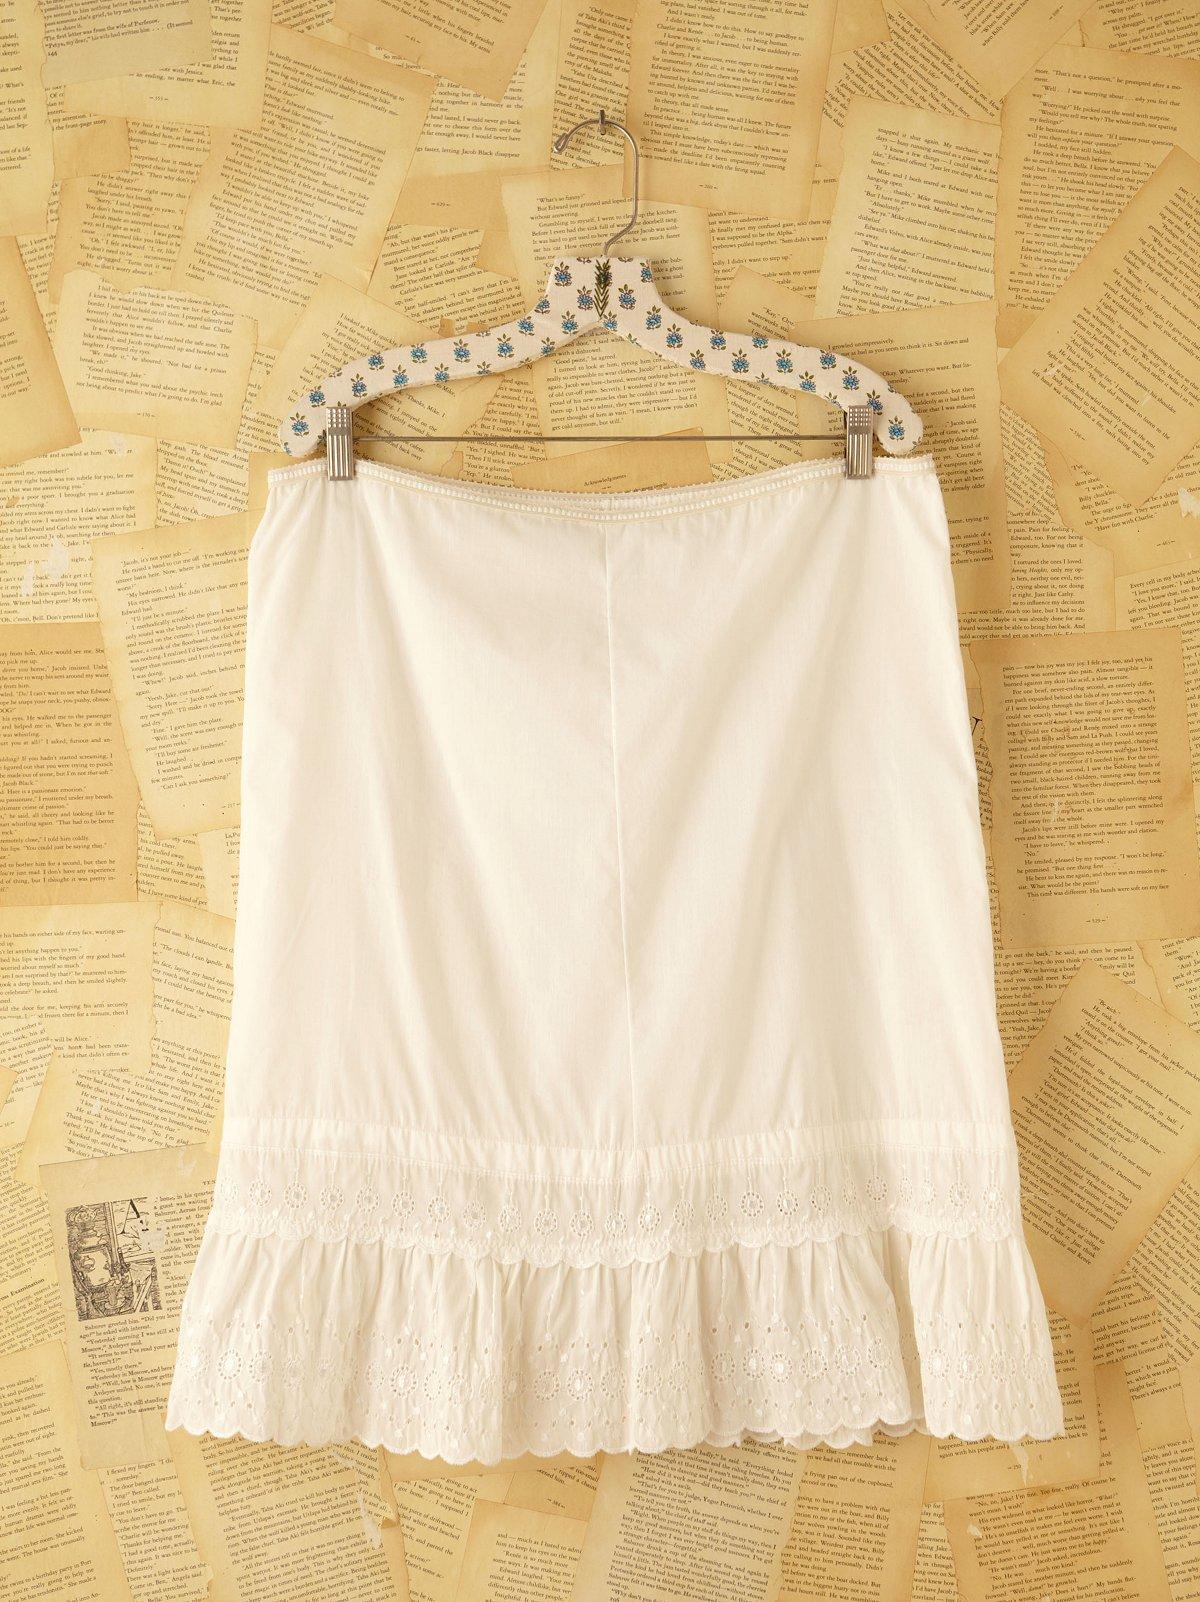 Vintage Cotton Slip Skirt